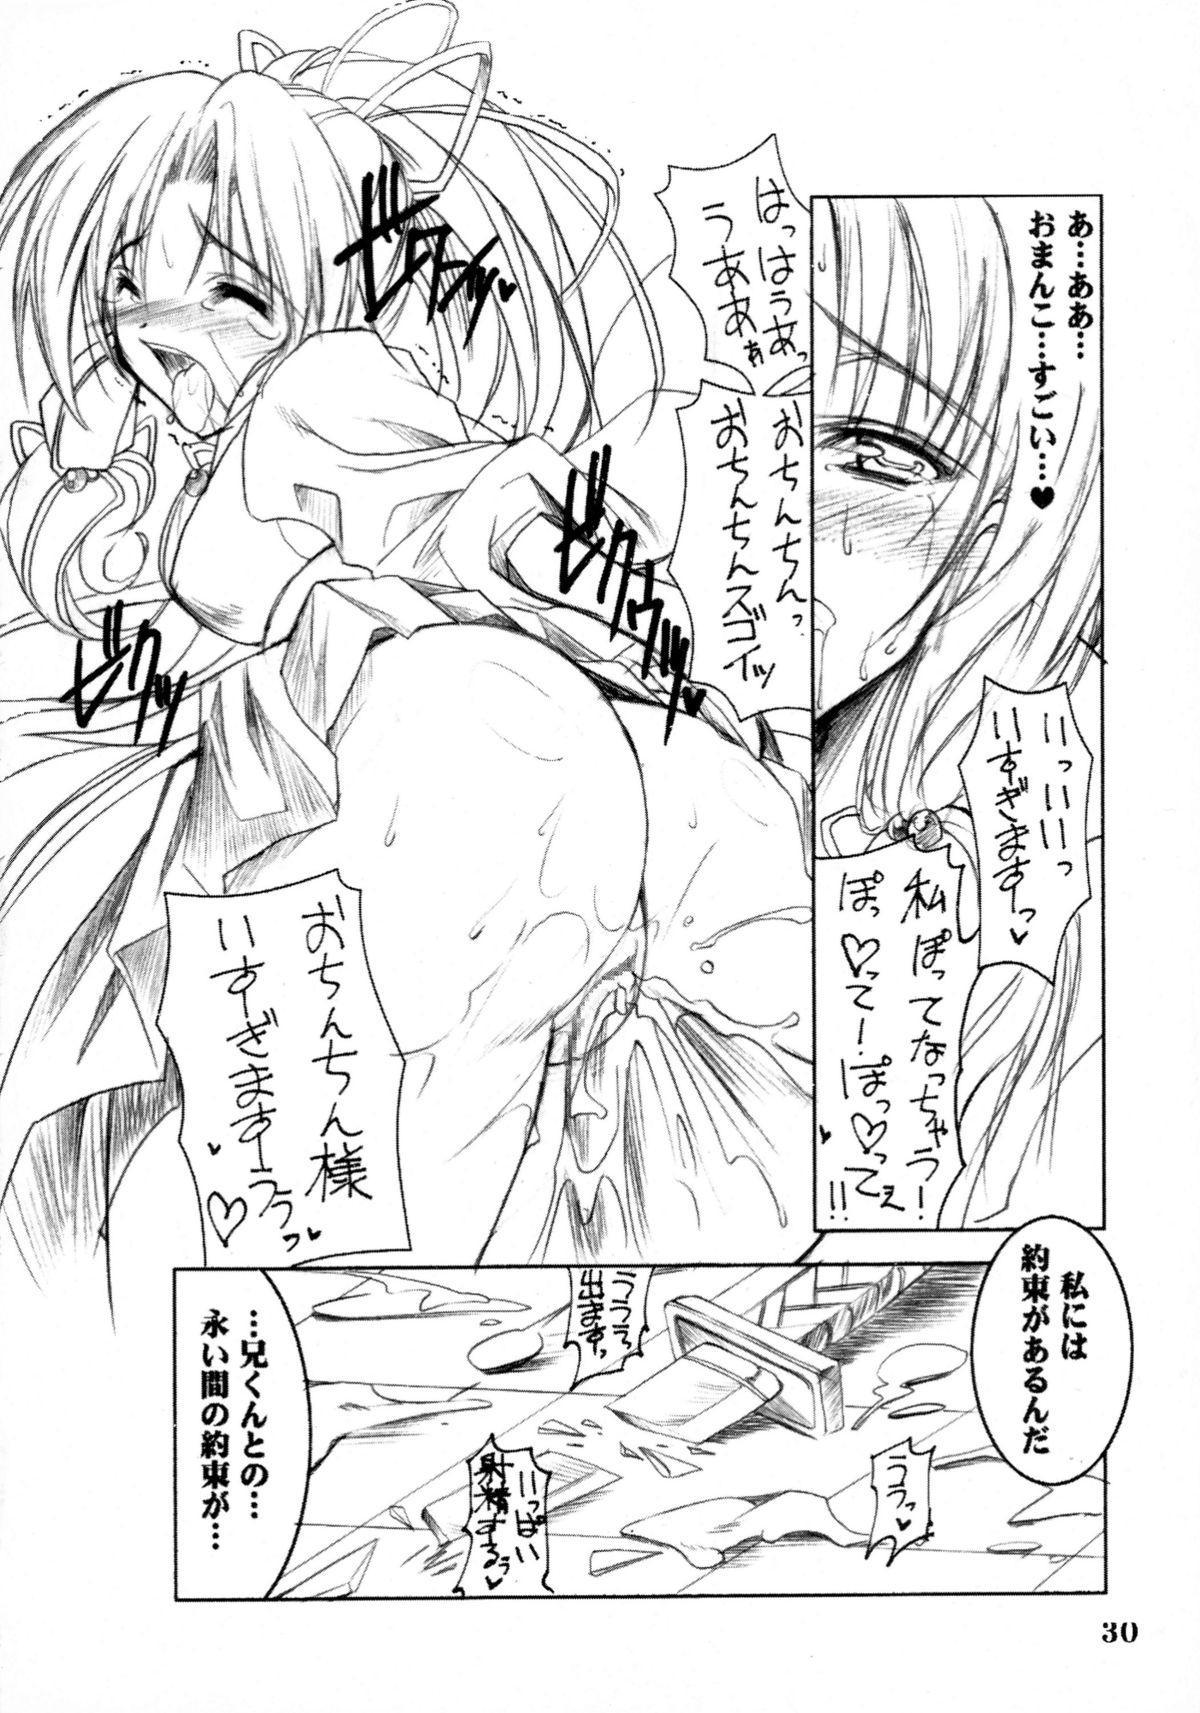 Binzume Sisters 2 28